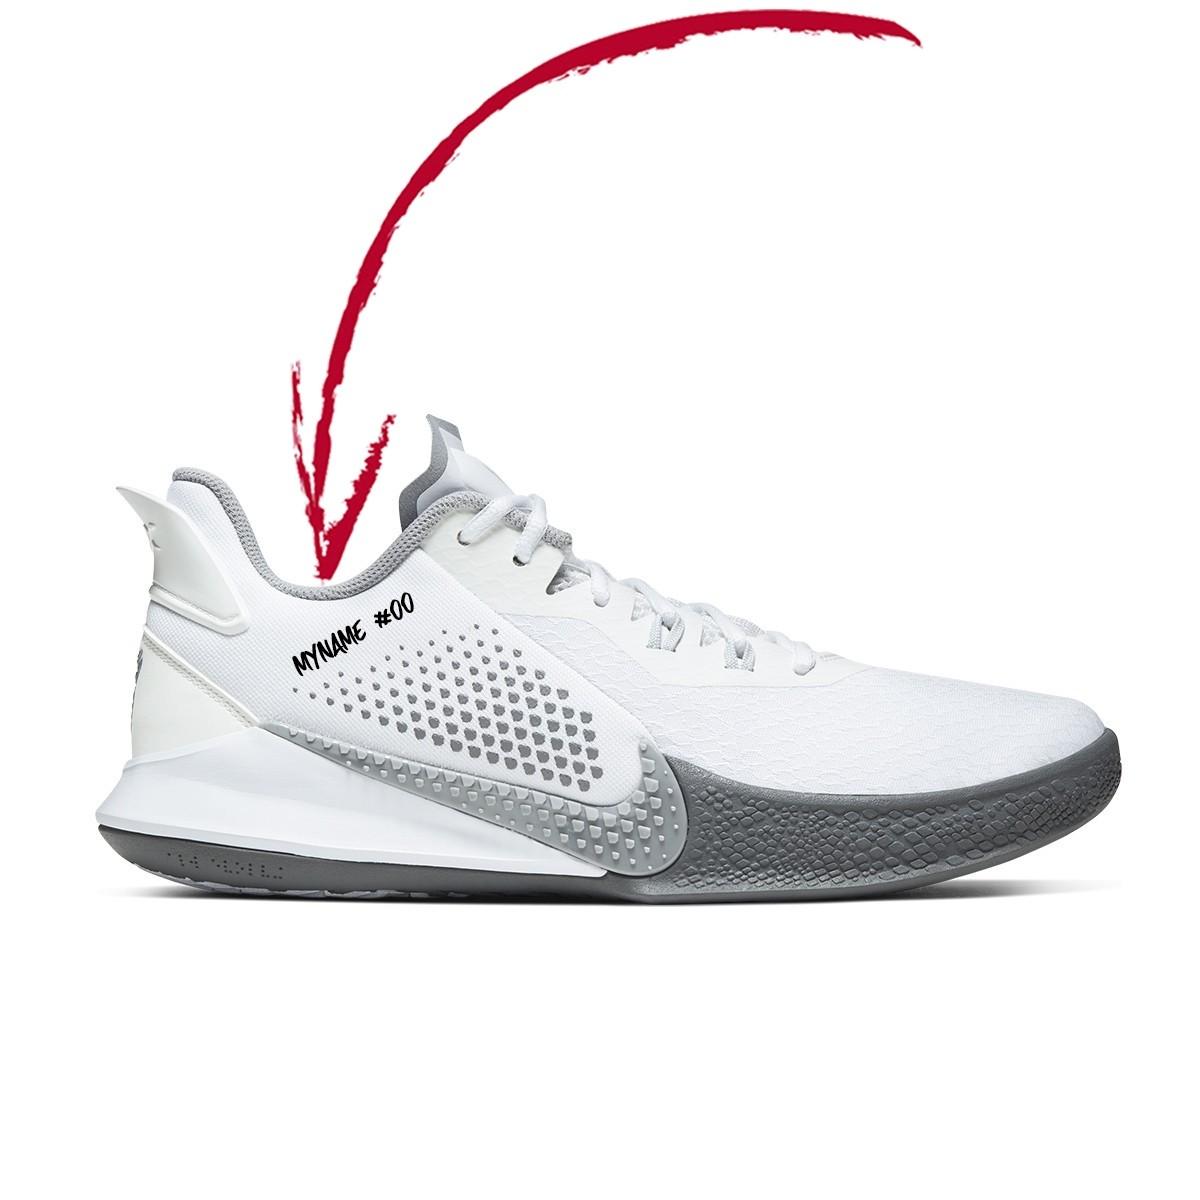 Nike Mamba Fury 'White'-CK2087-100